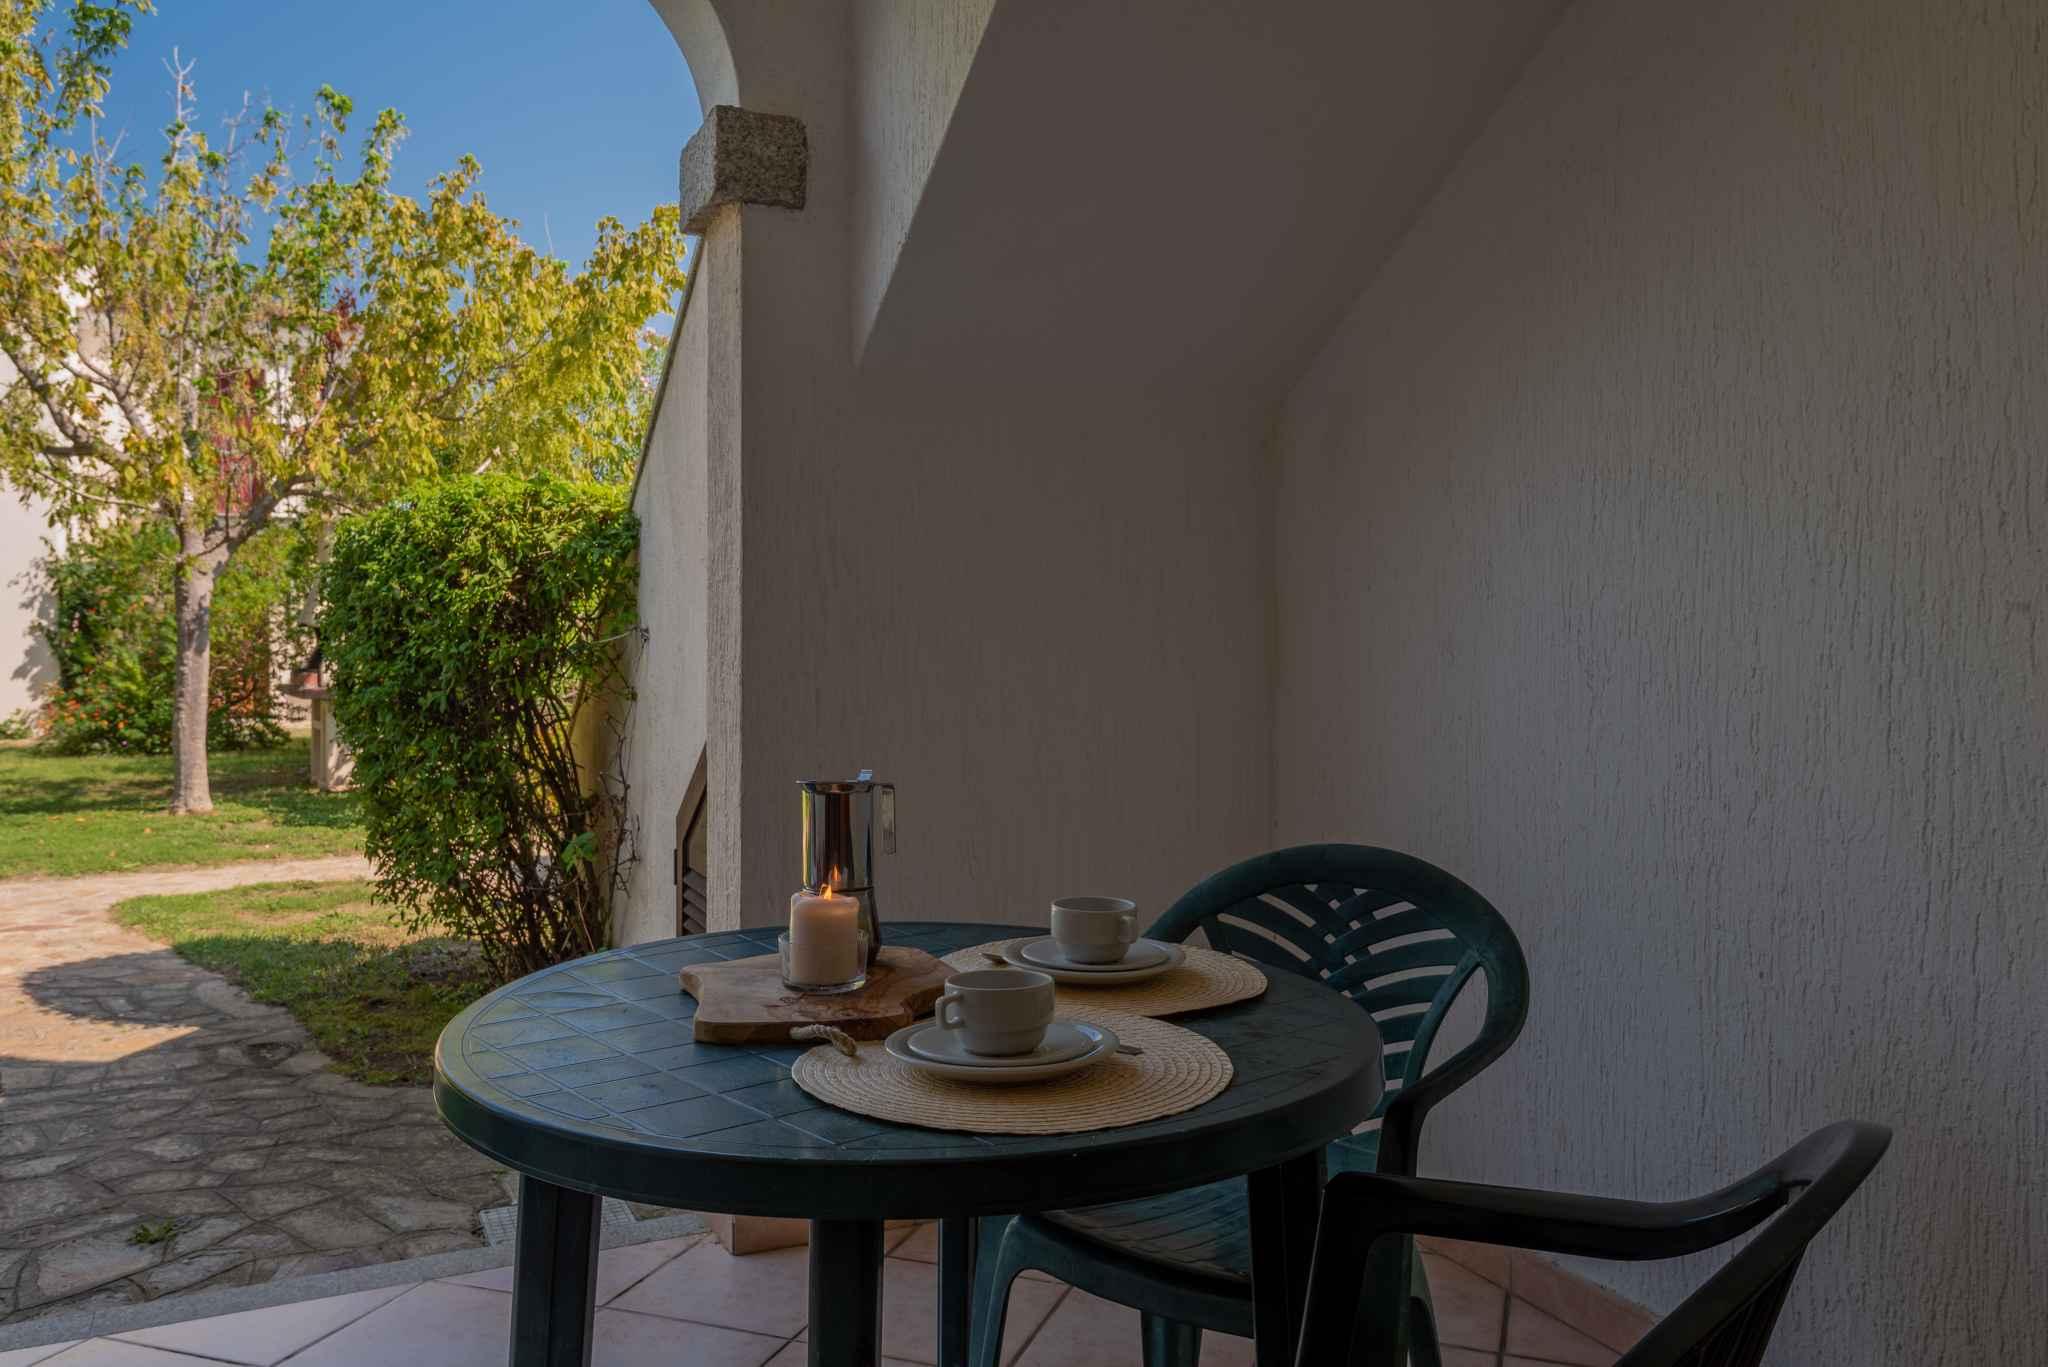 Ferienwohnung Appartamento 4 persone (2853260), Budoni, Olbia-Tempio, Sardinien, Italien, Bild 2